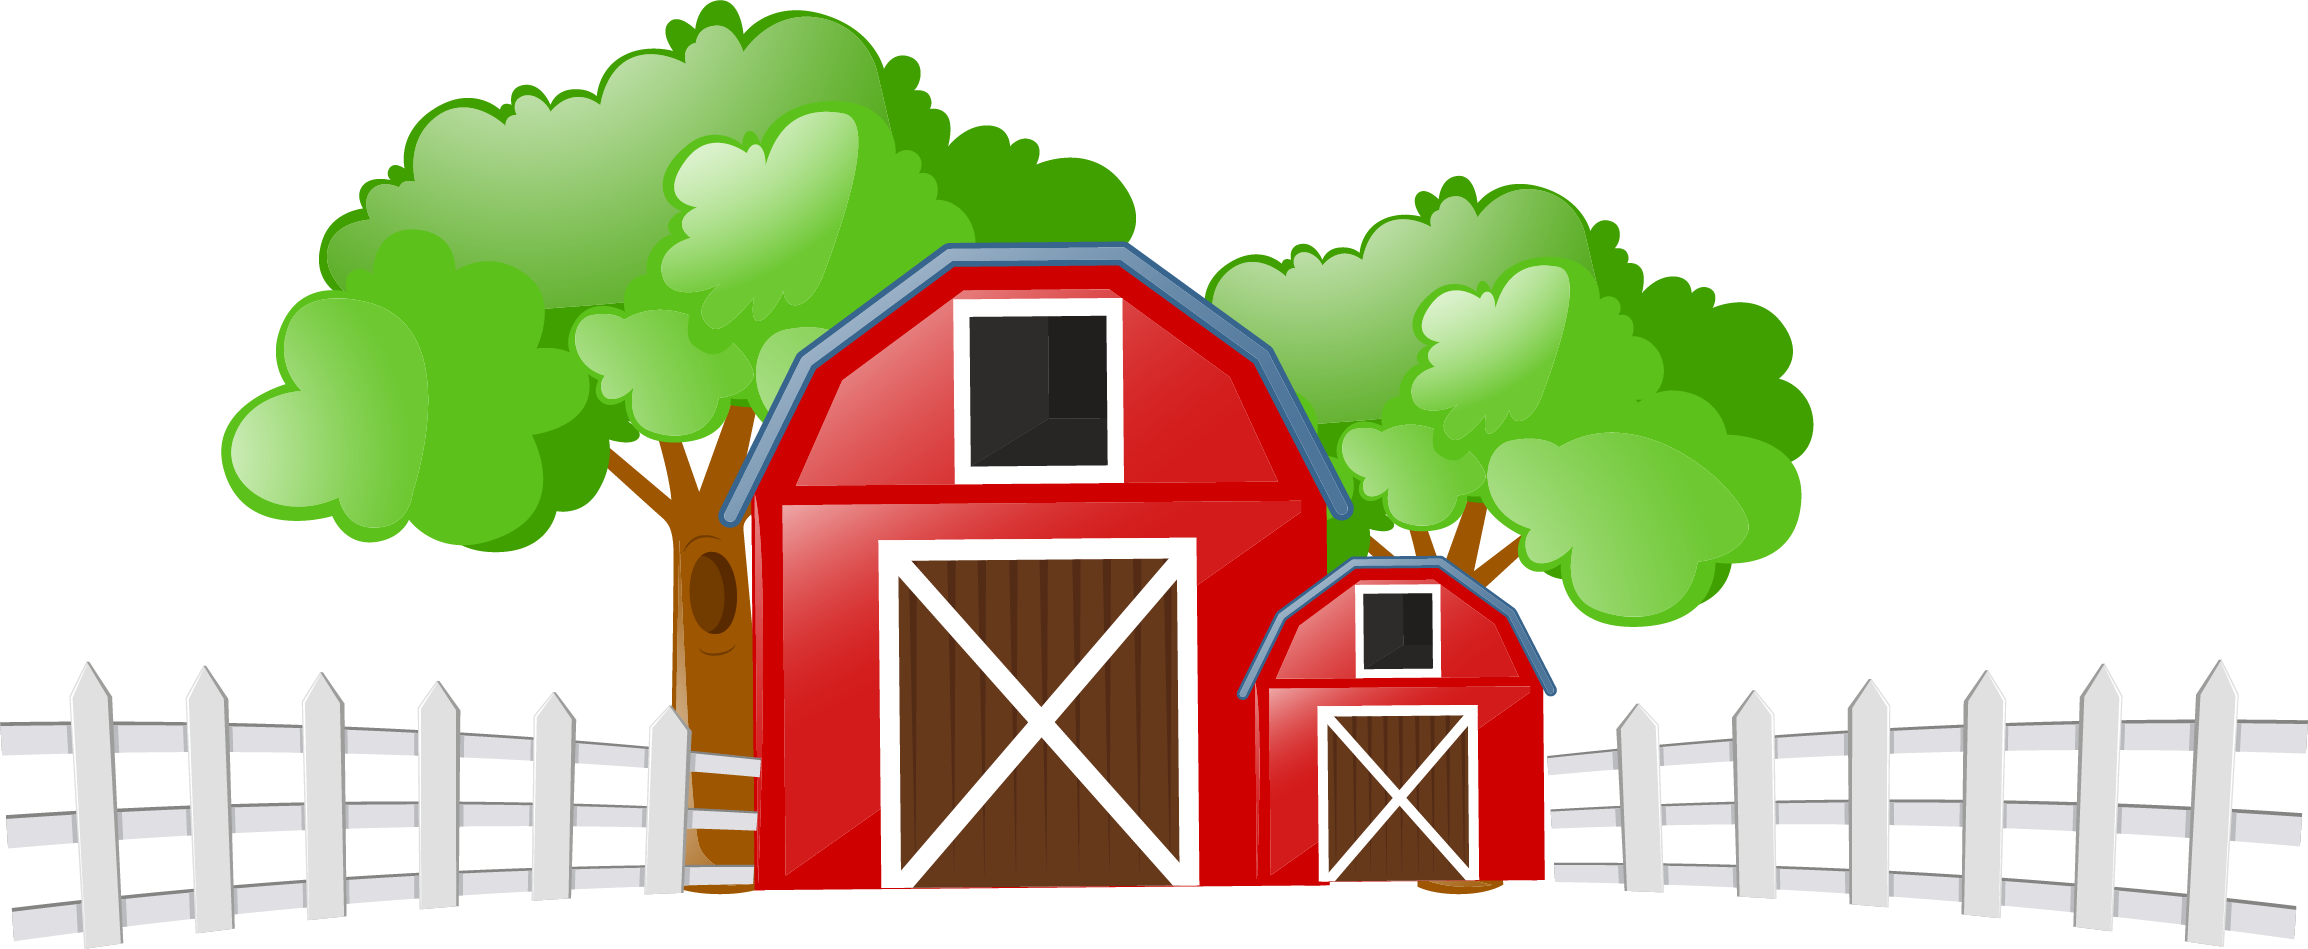 Cattle livestock clip art. Farm clipart farm field